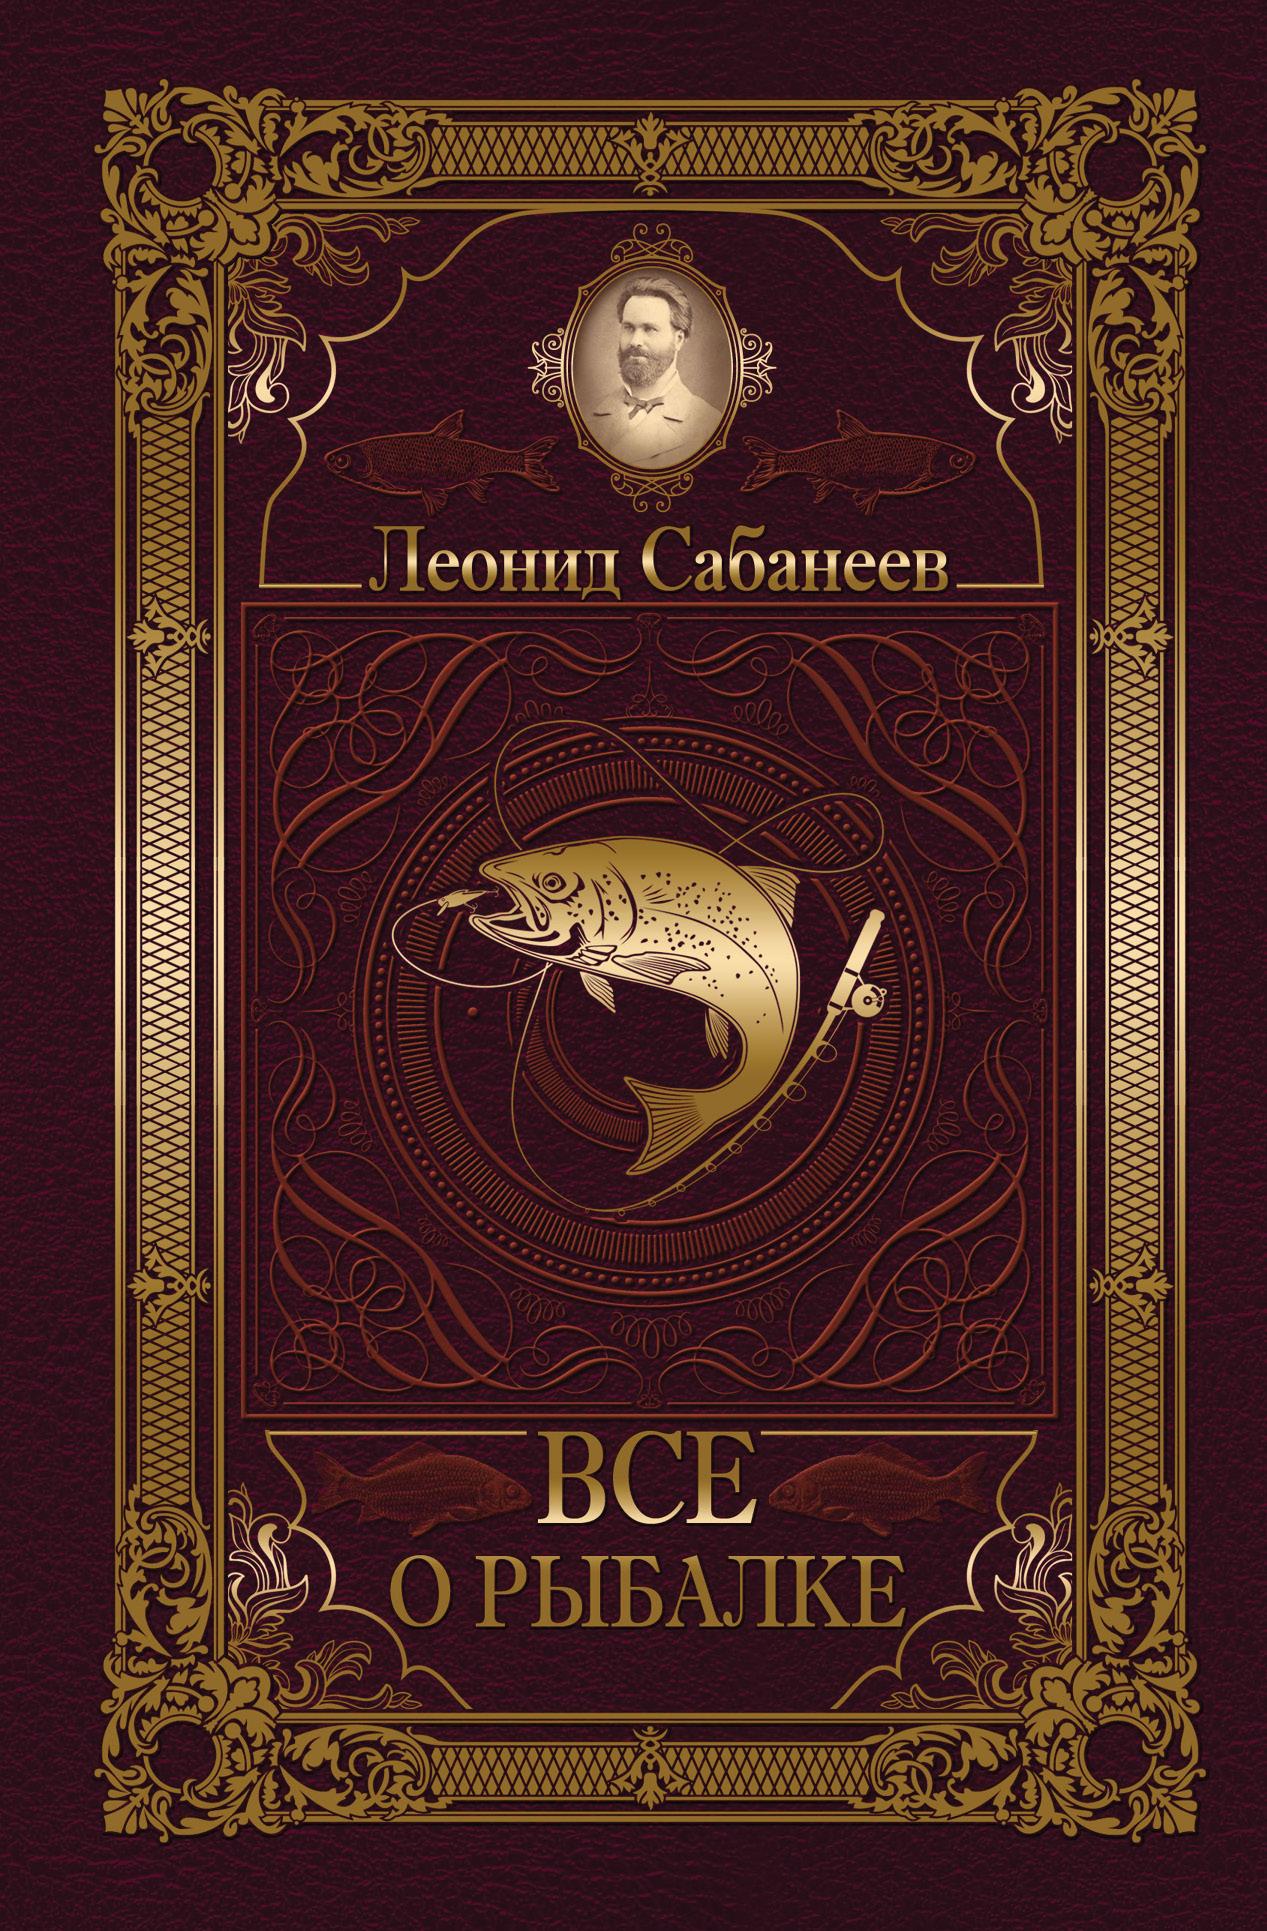 Сборник книг по рыбалке